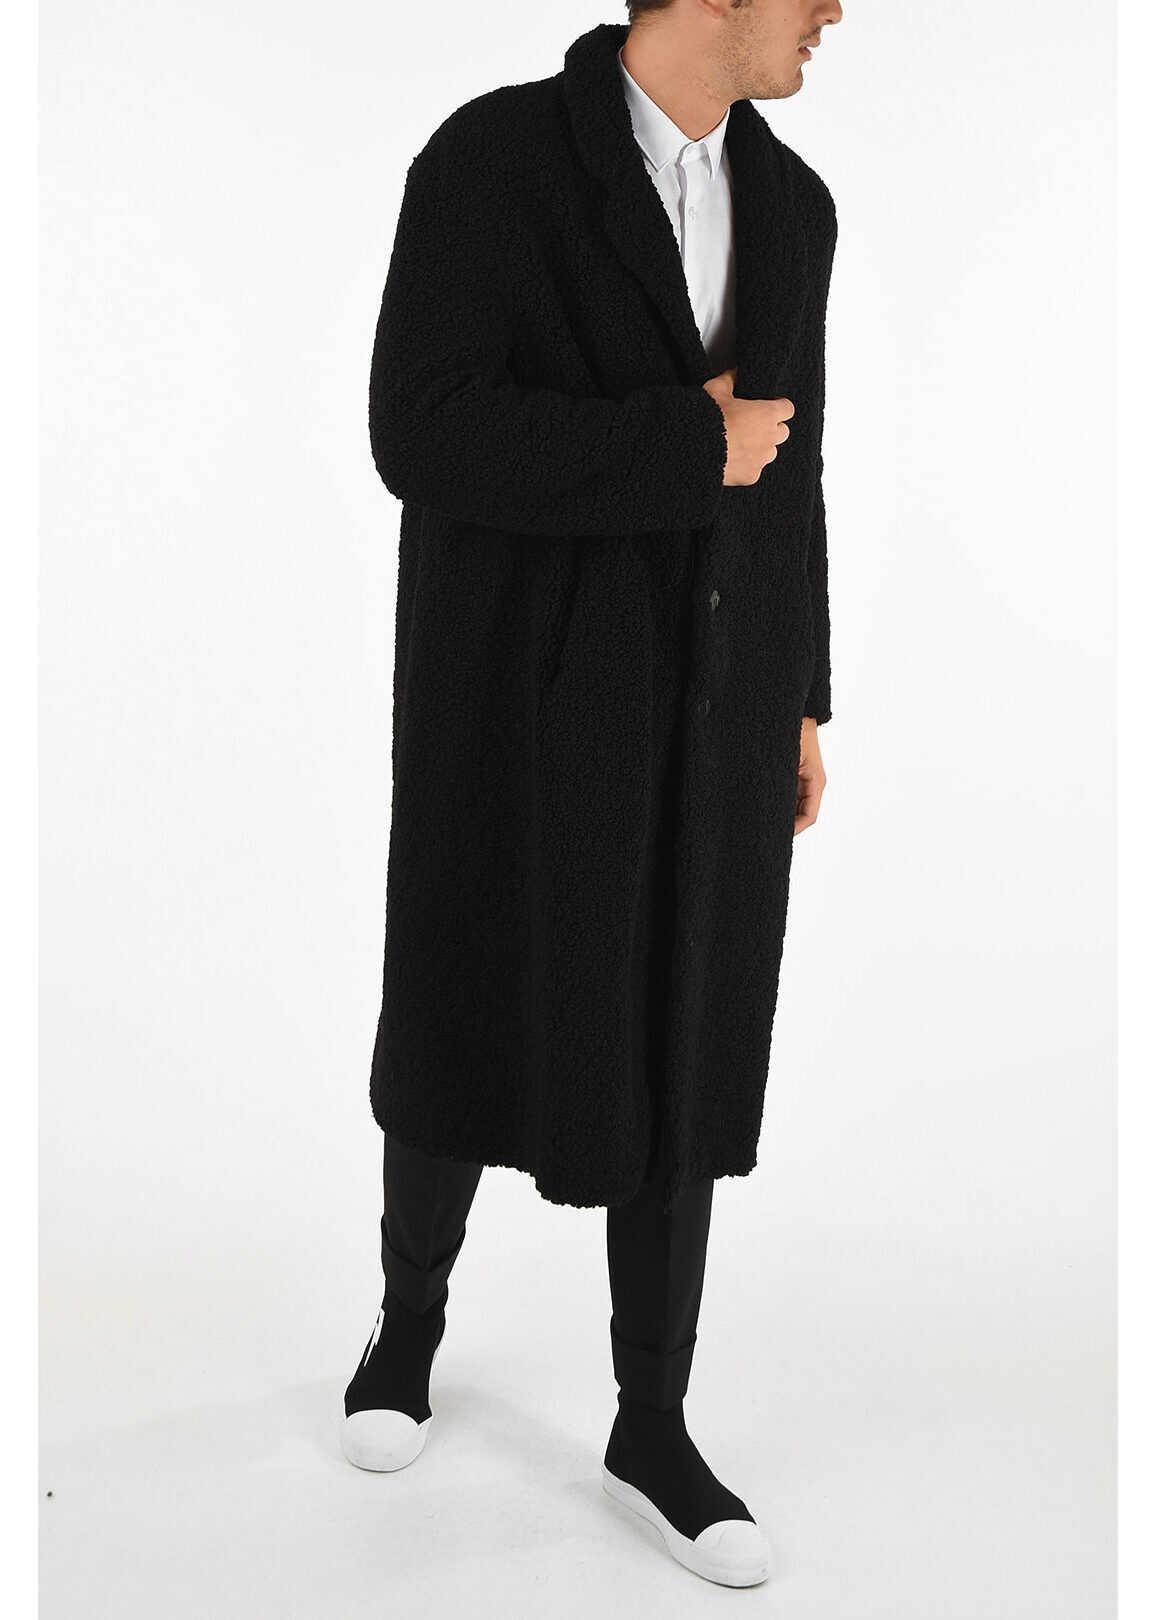 Neil Barrett Faux Fur Slim Fit Coat BLACK imagine